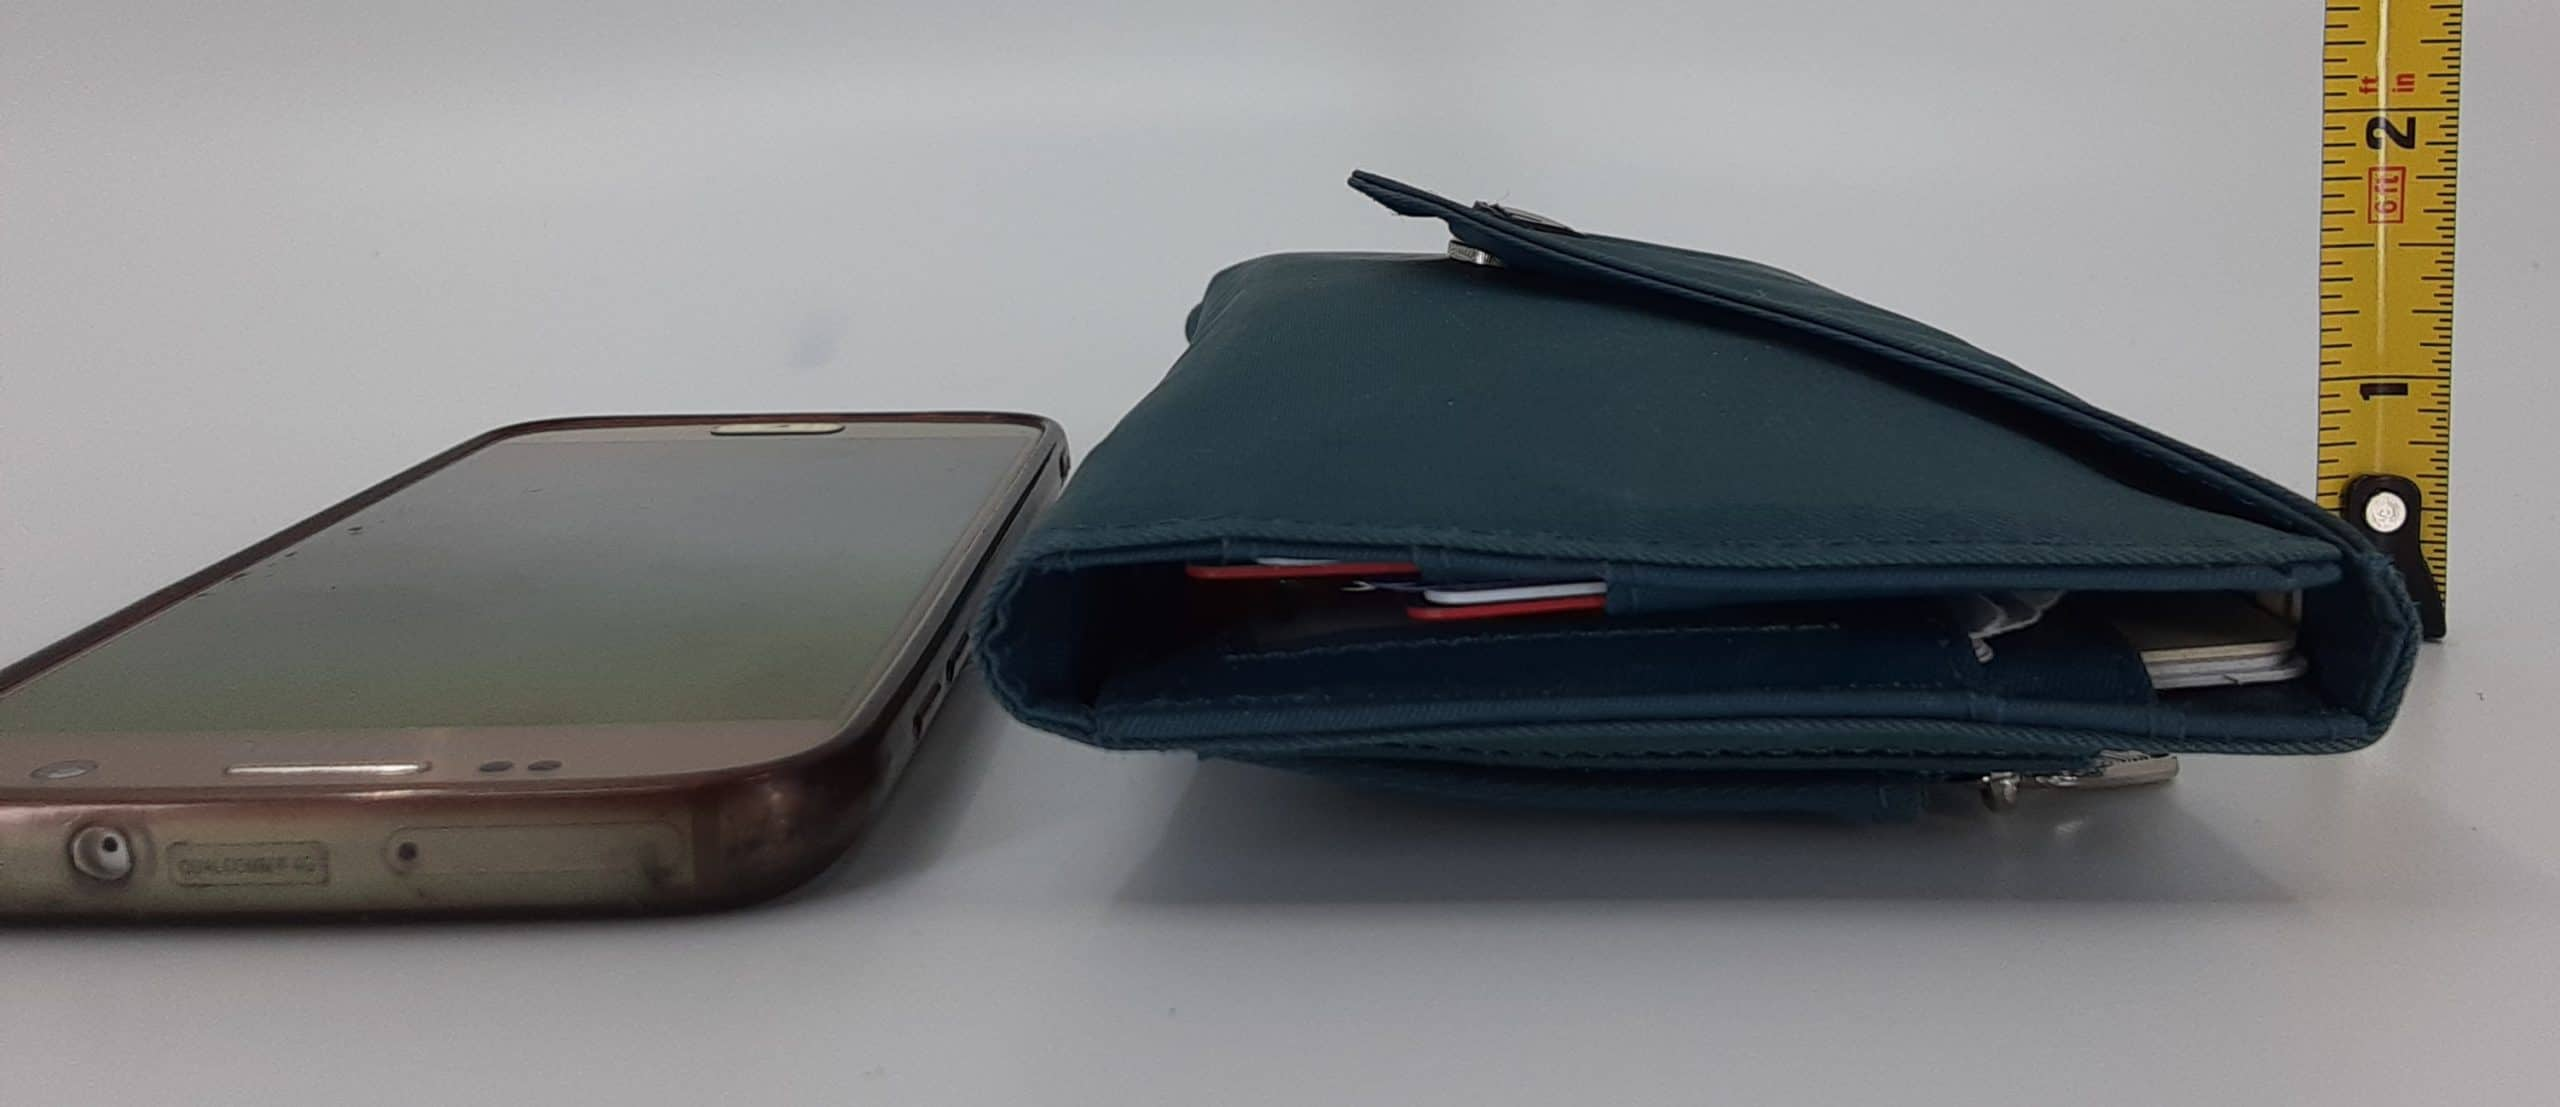 Big Skinny travel wallet - profile